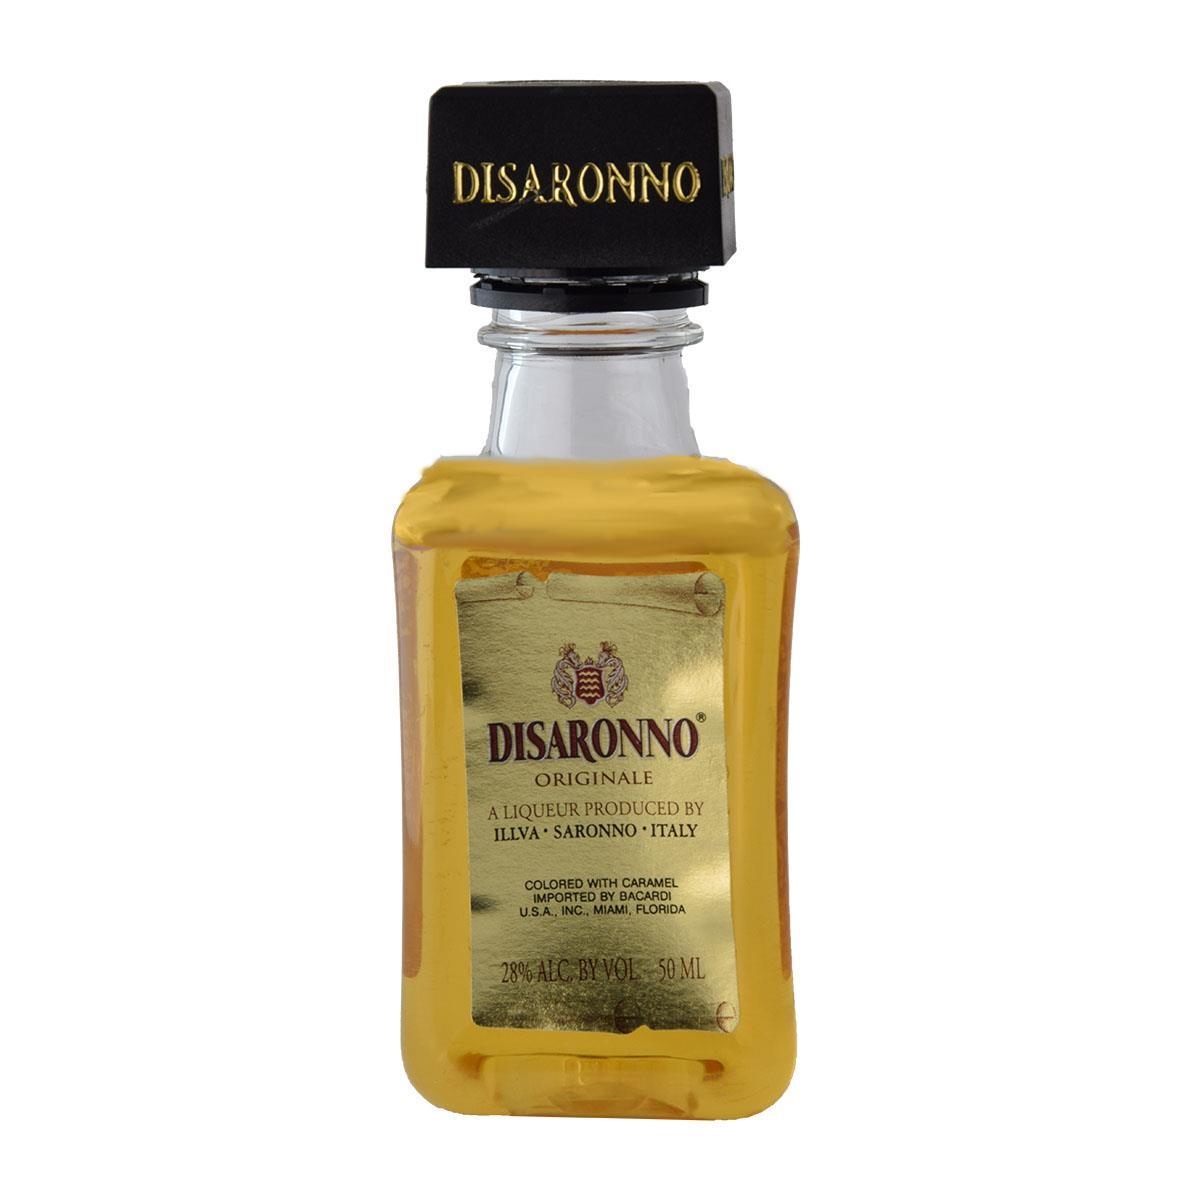 Disaronno Originale Liqueur 50ml